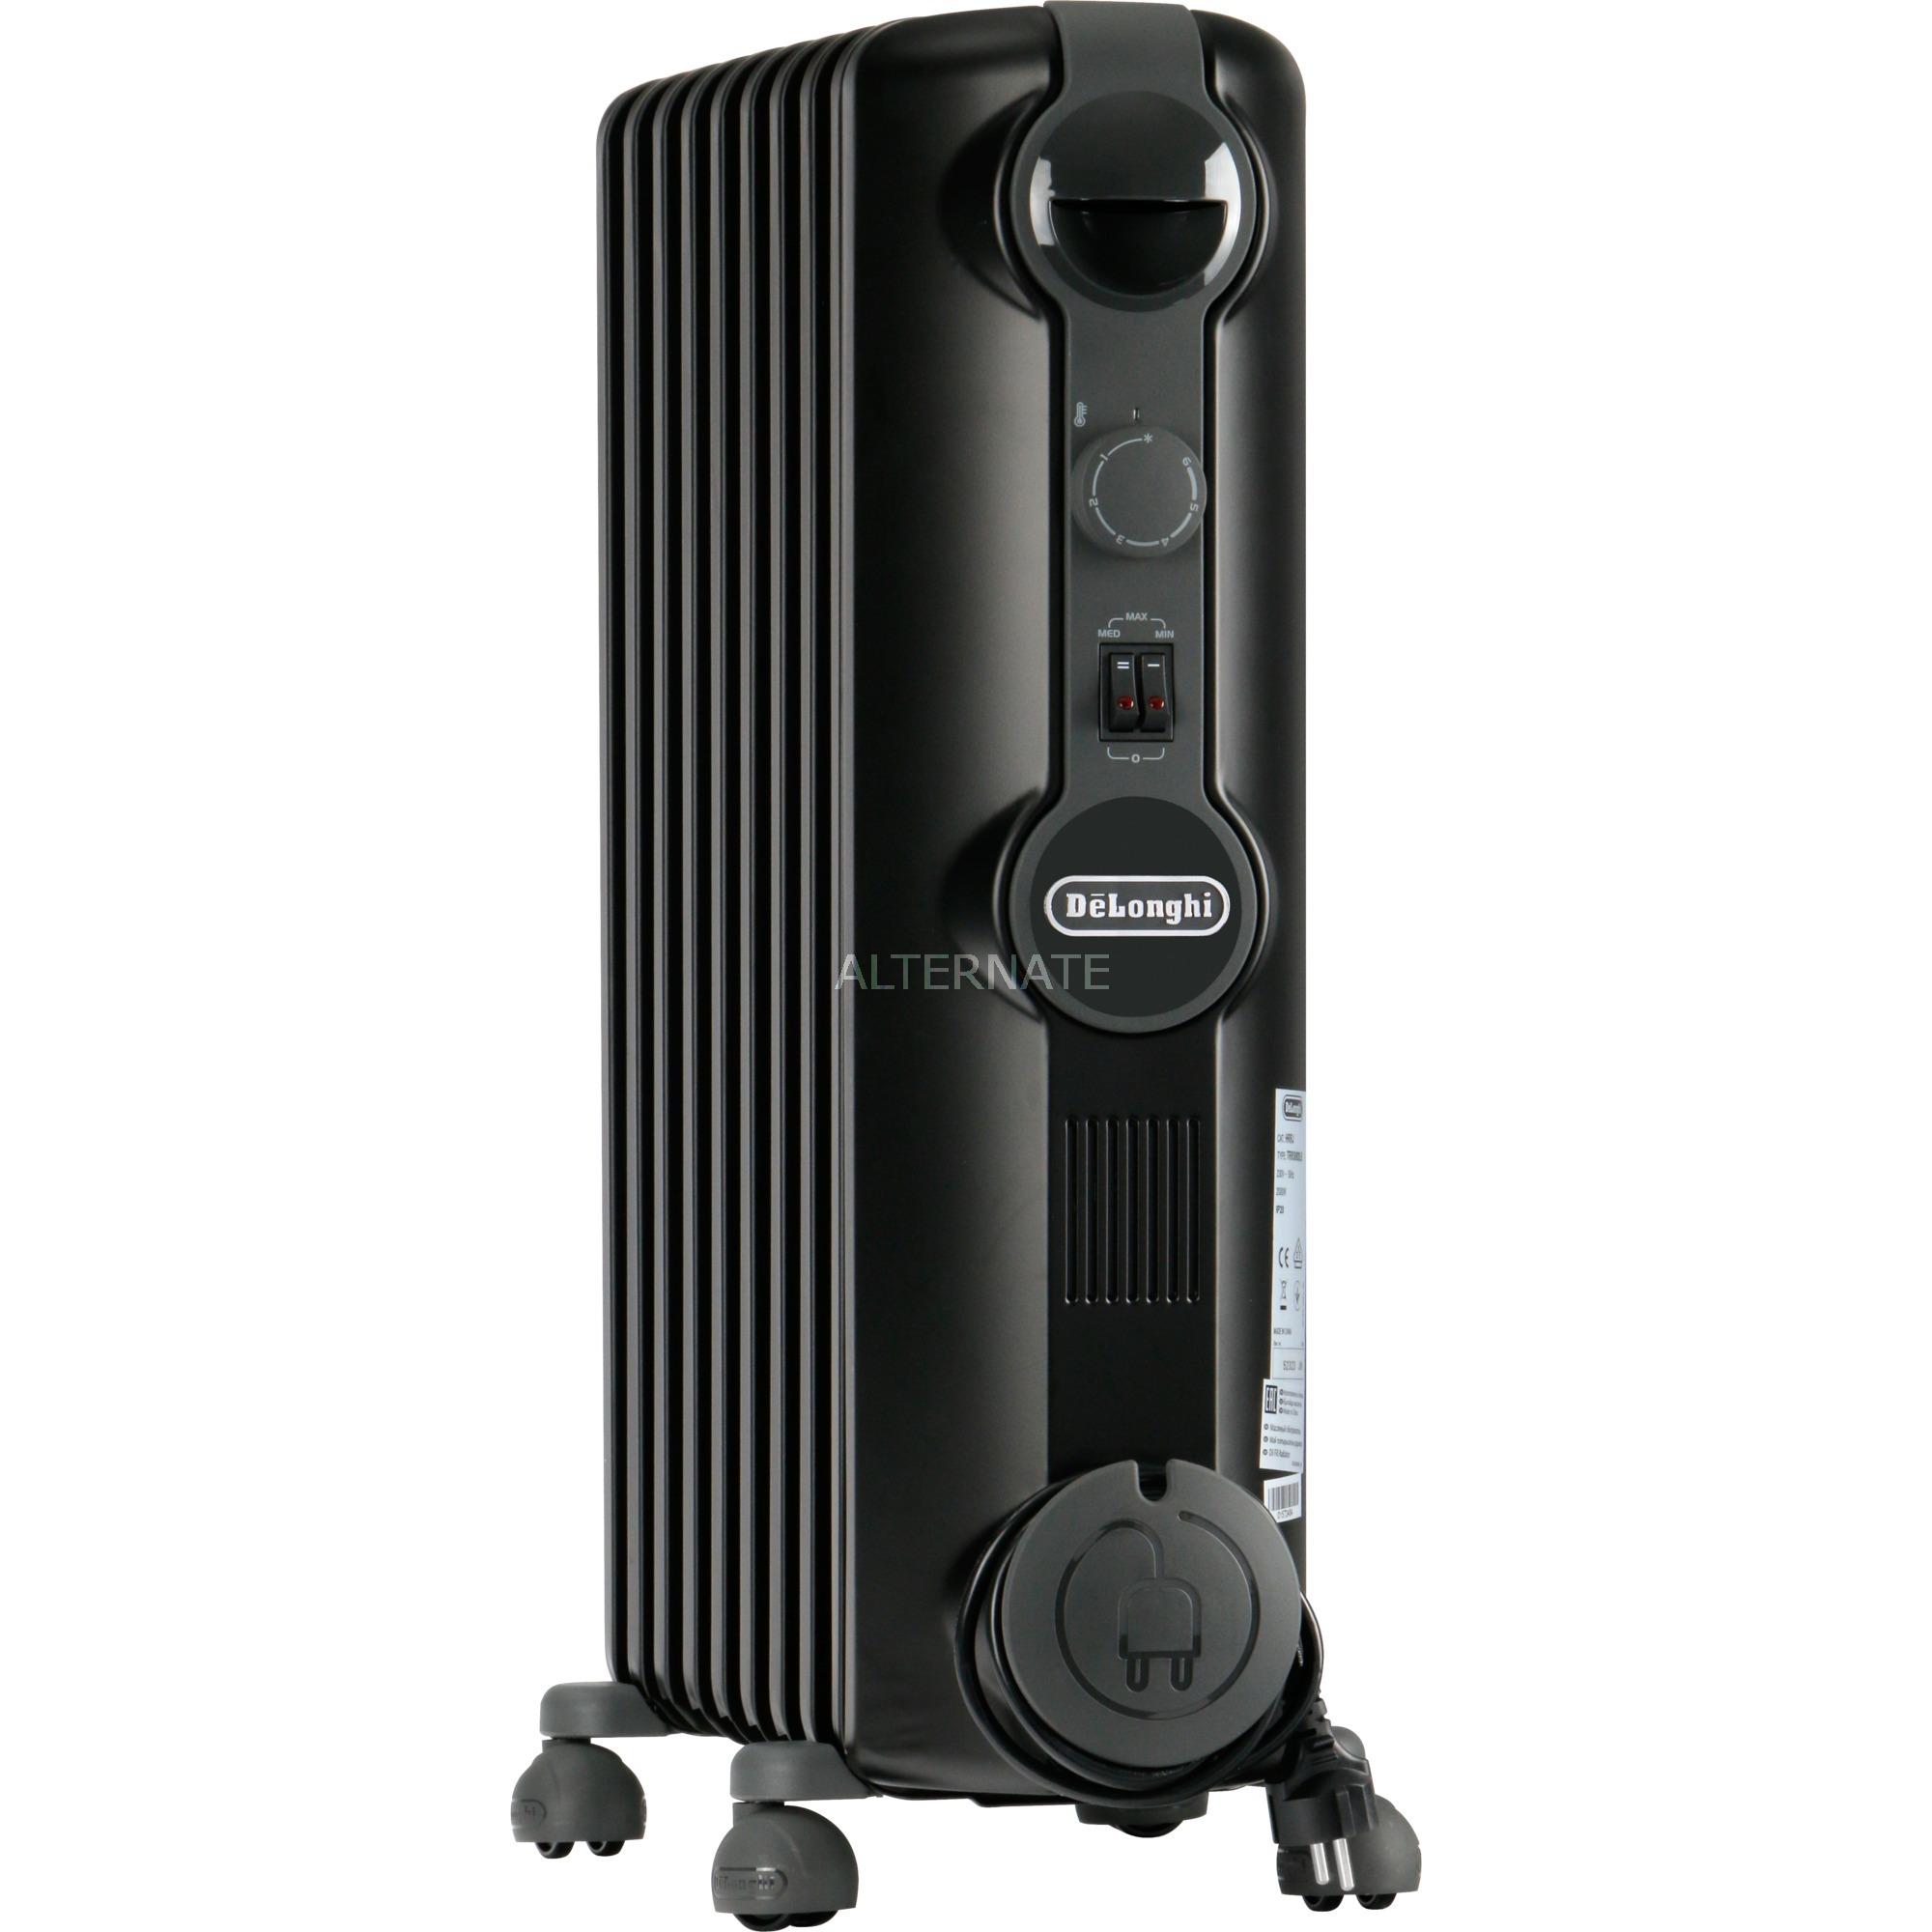 hudson reed radiatore calorifero design verticale acciaio. Black Bedroom Furniture Sets. Home Design Ideas